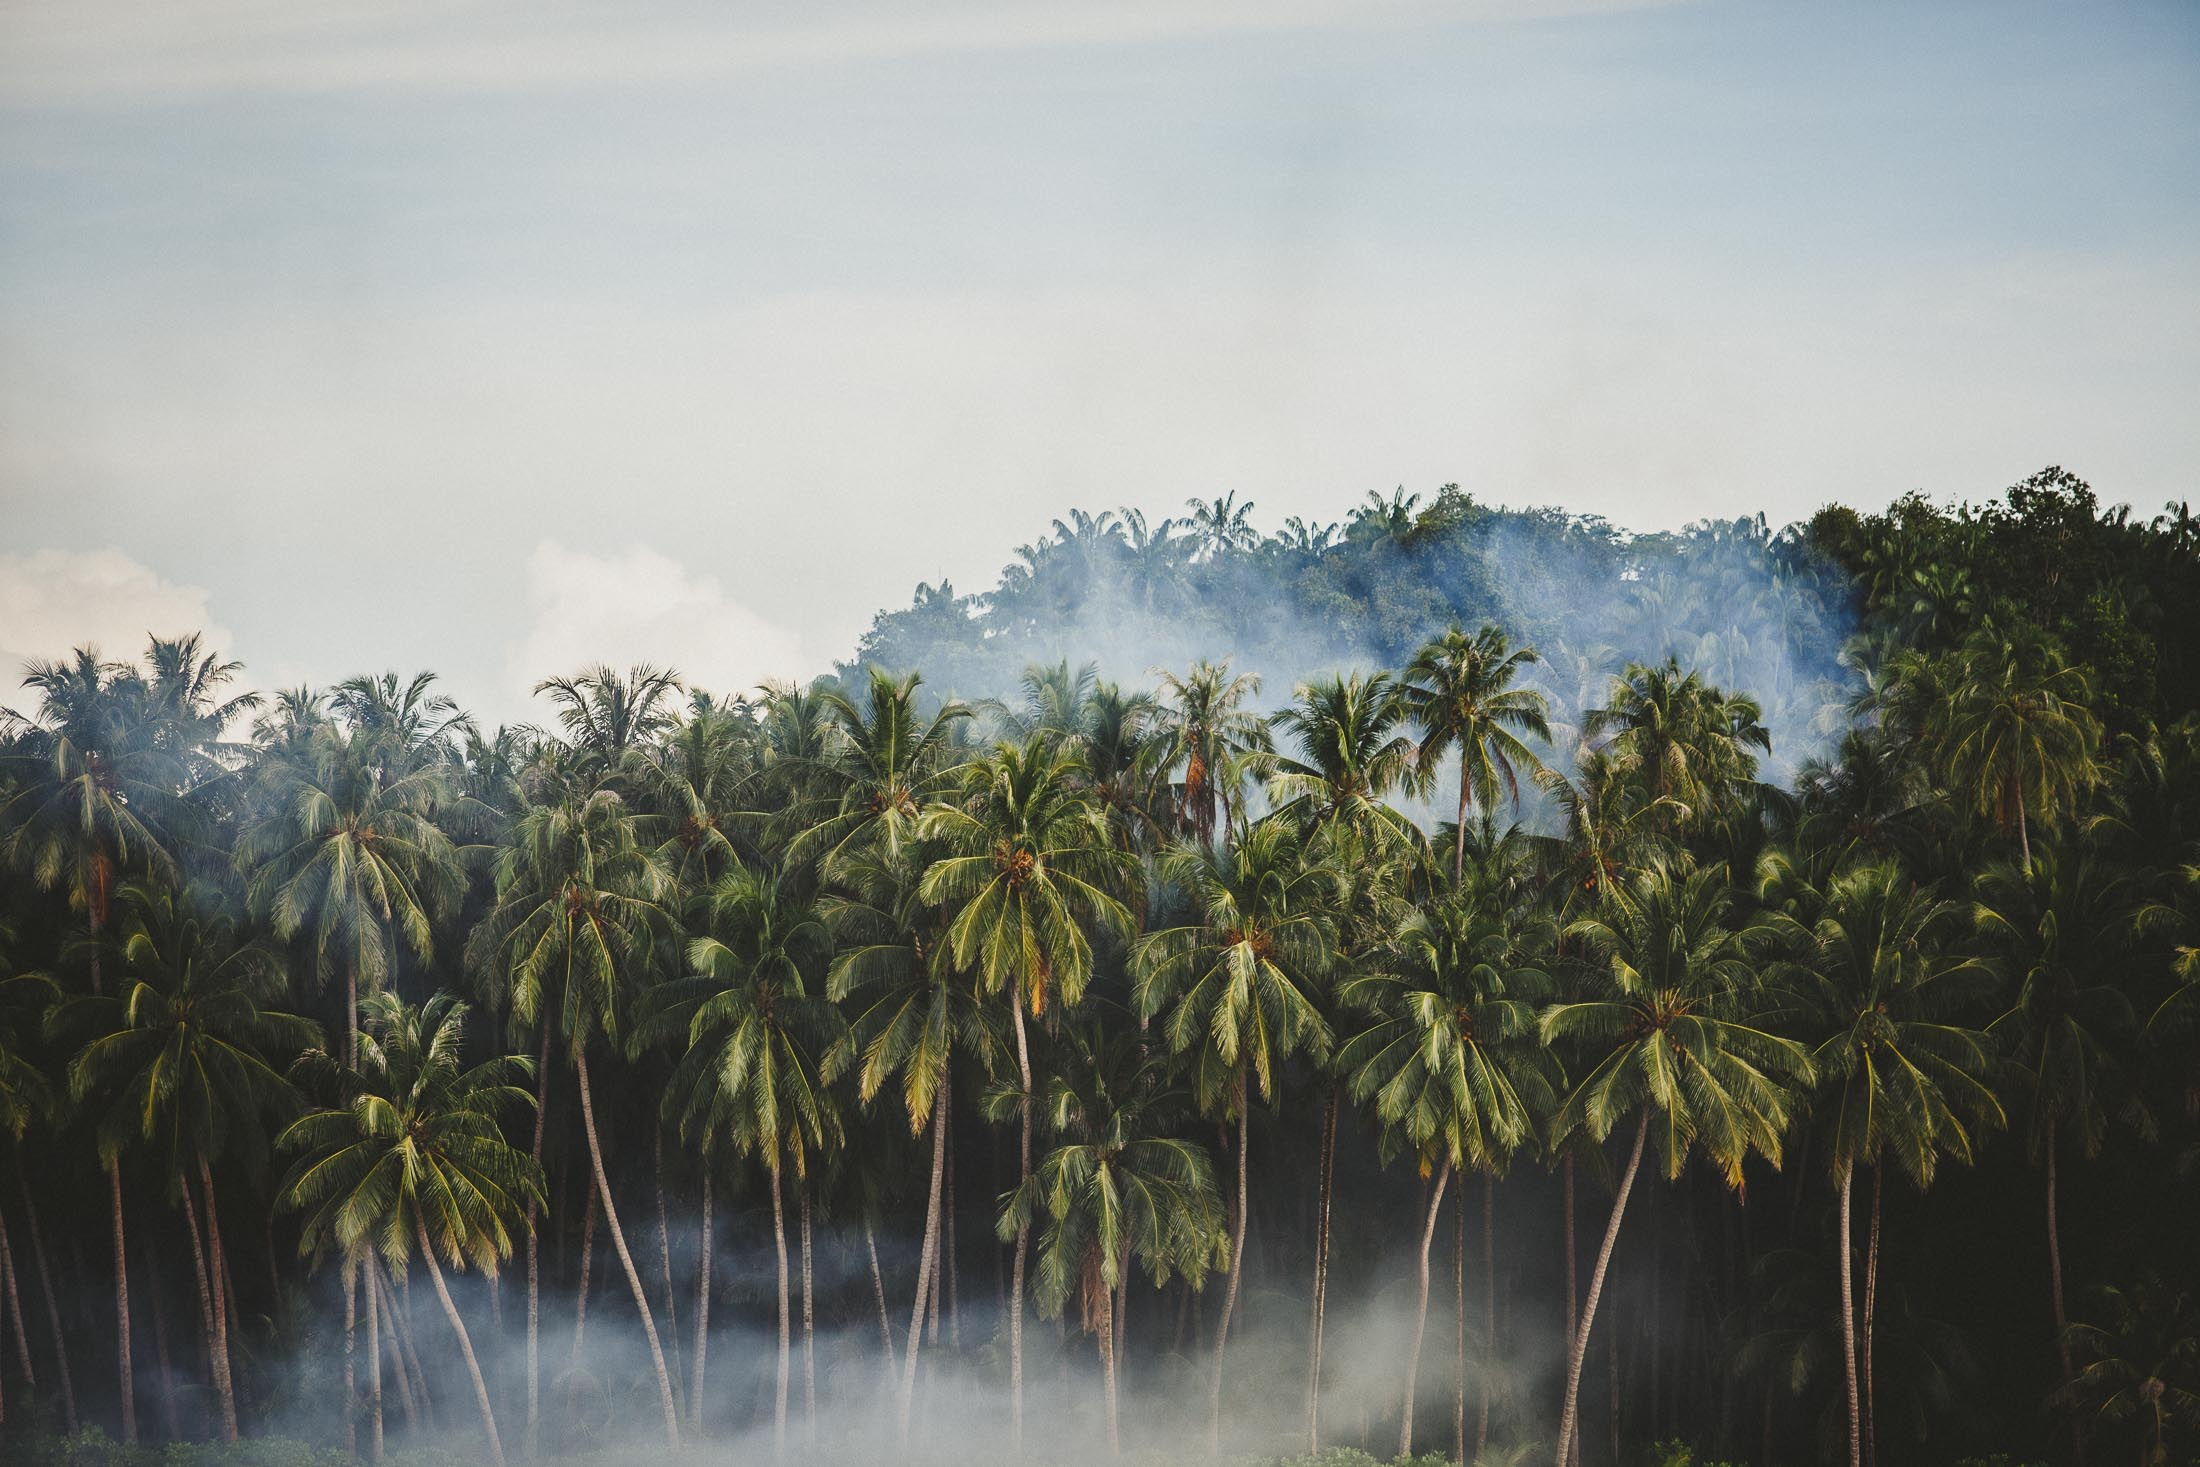 TELO ISLANDS 6